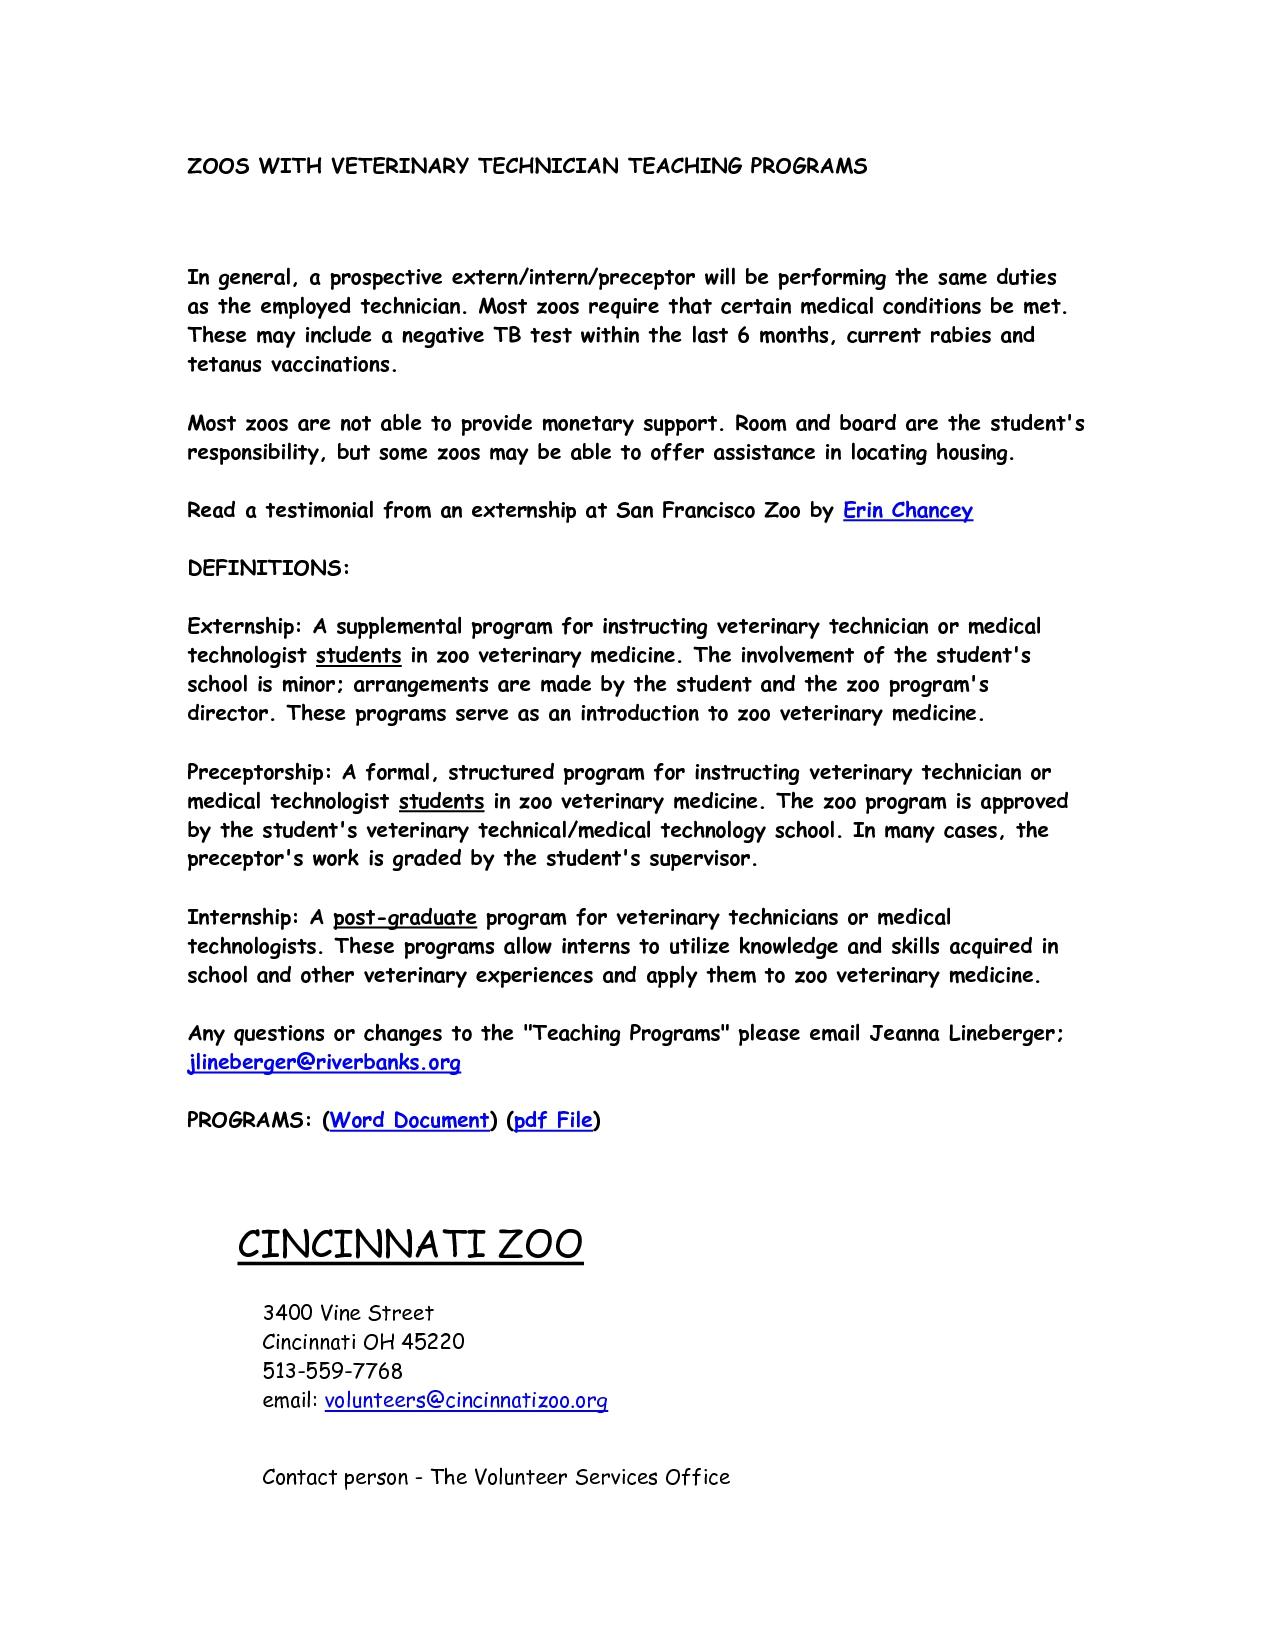 Veteran Letter Template - Zoo Cover Letter Acurnamedia